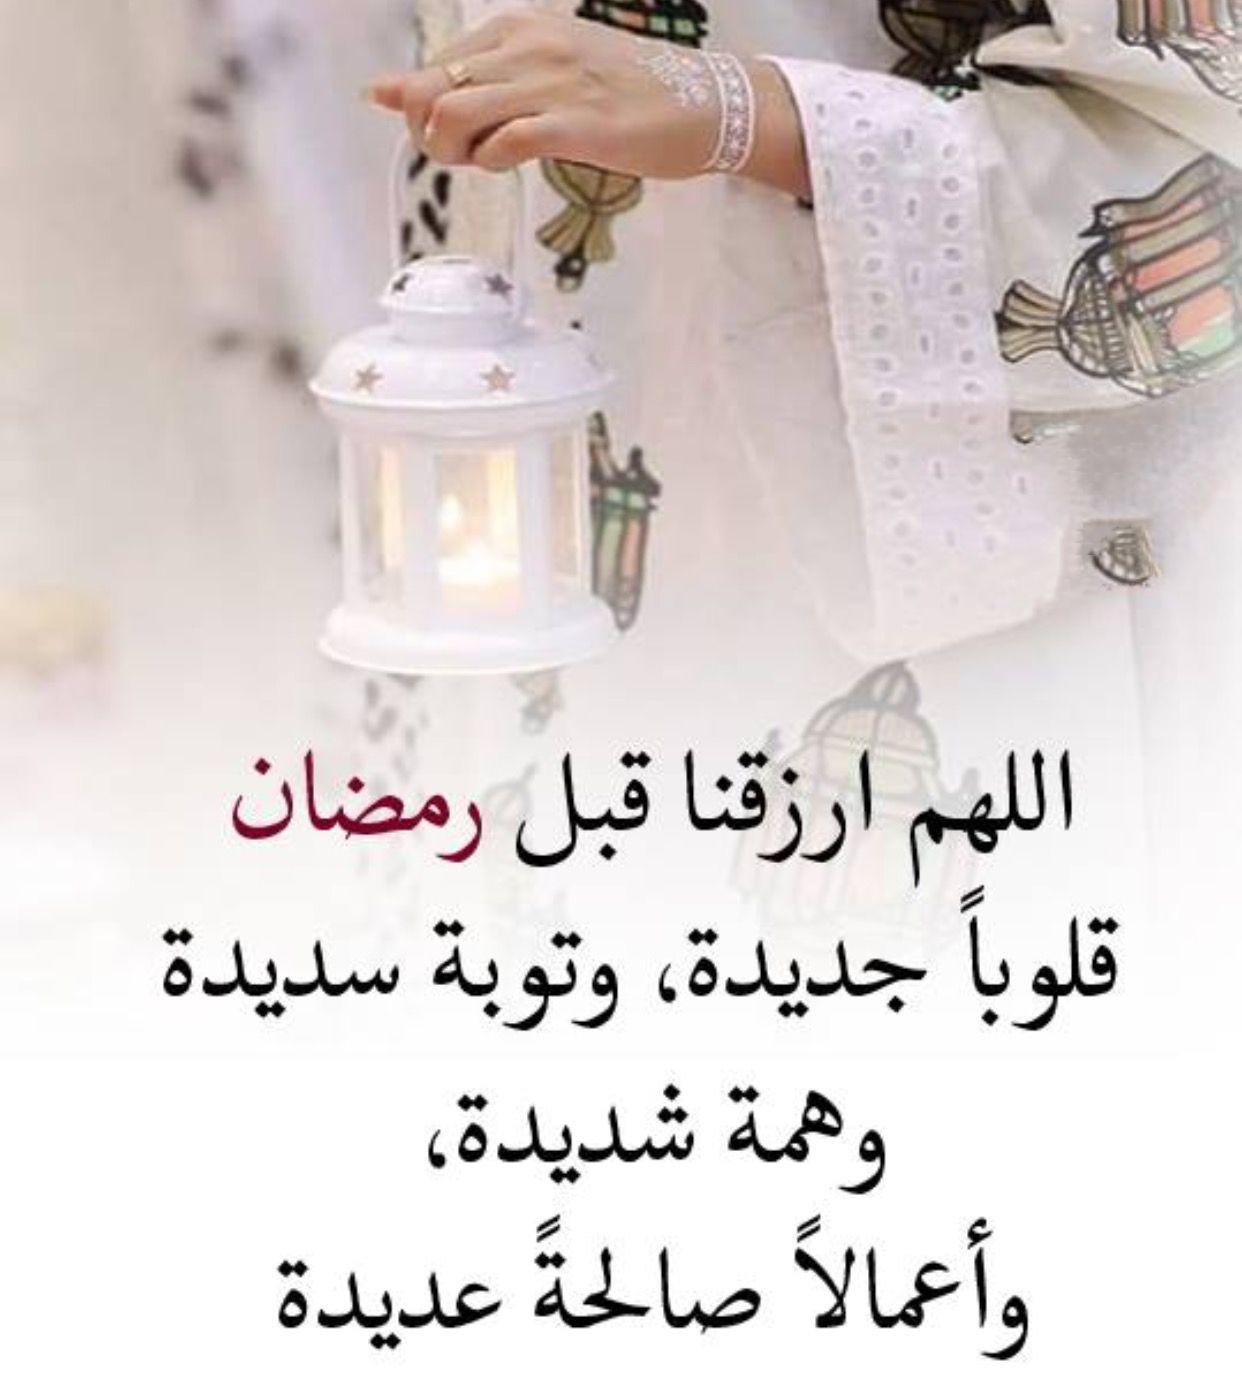 Pin By Butuk Swyt On Islam اسلام Ramadan Prayer Ramadan Islamic Quotes